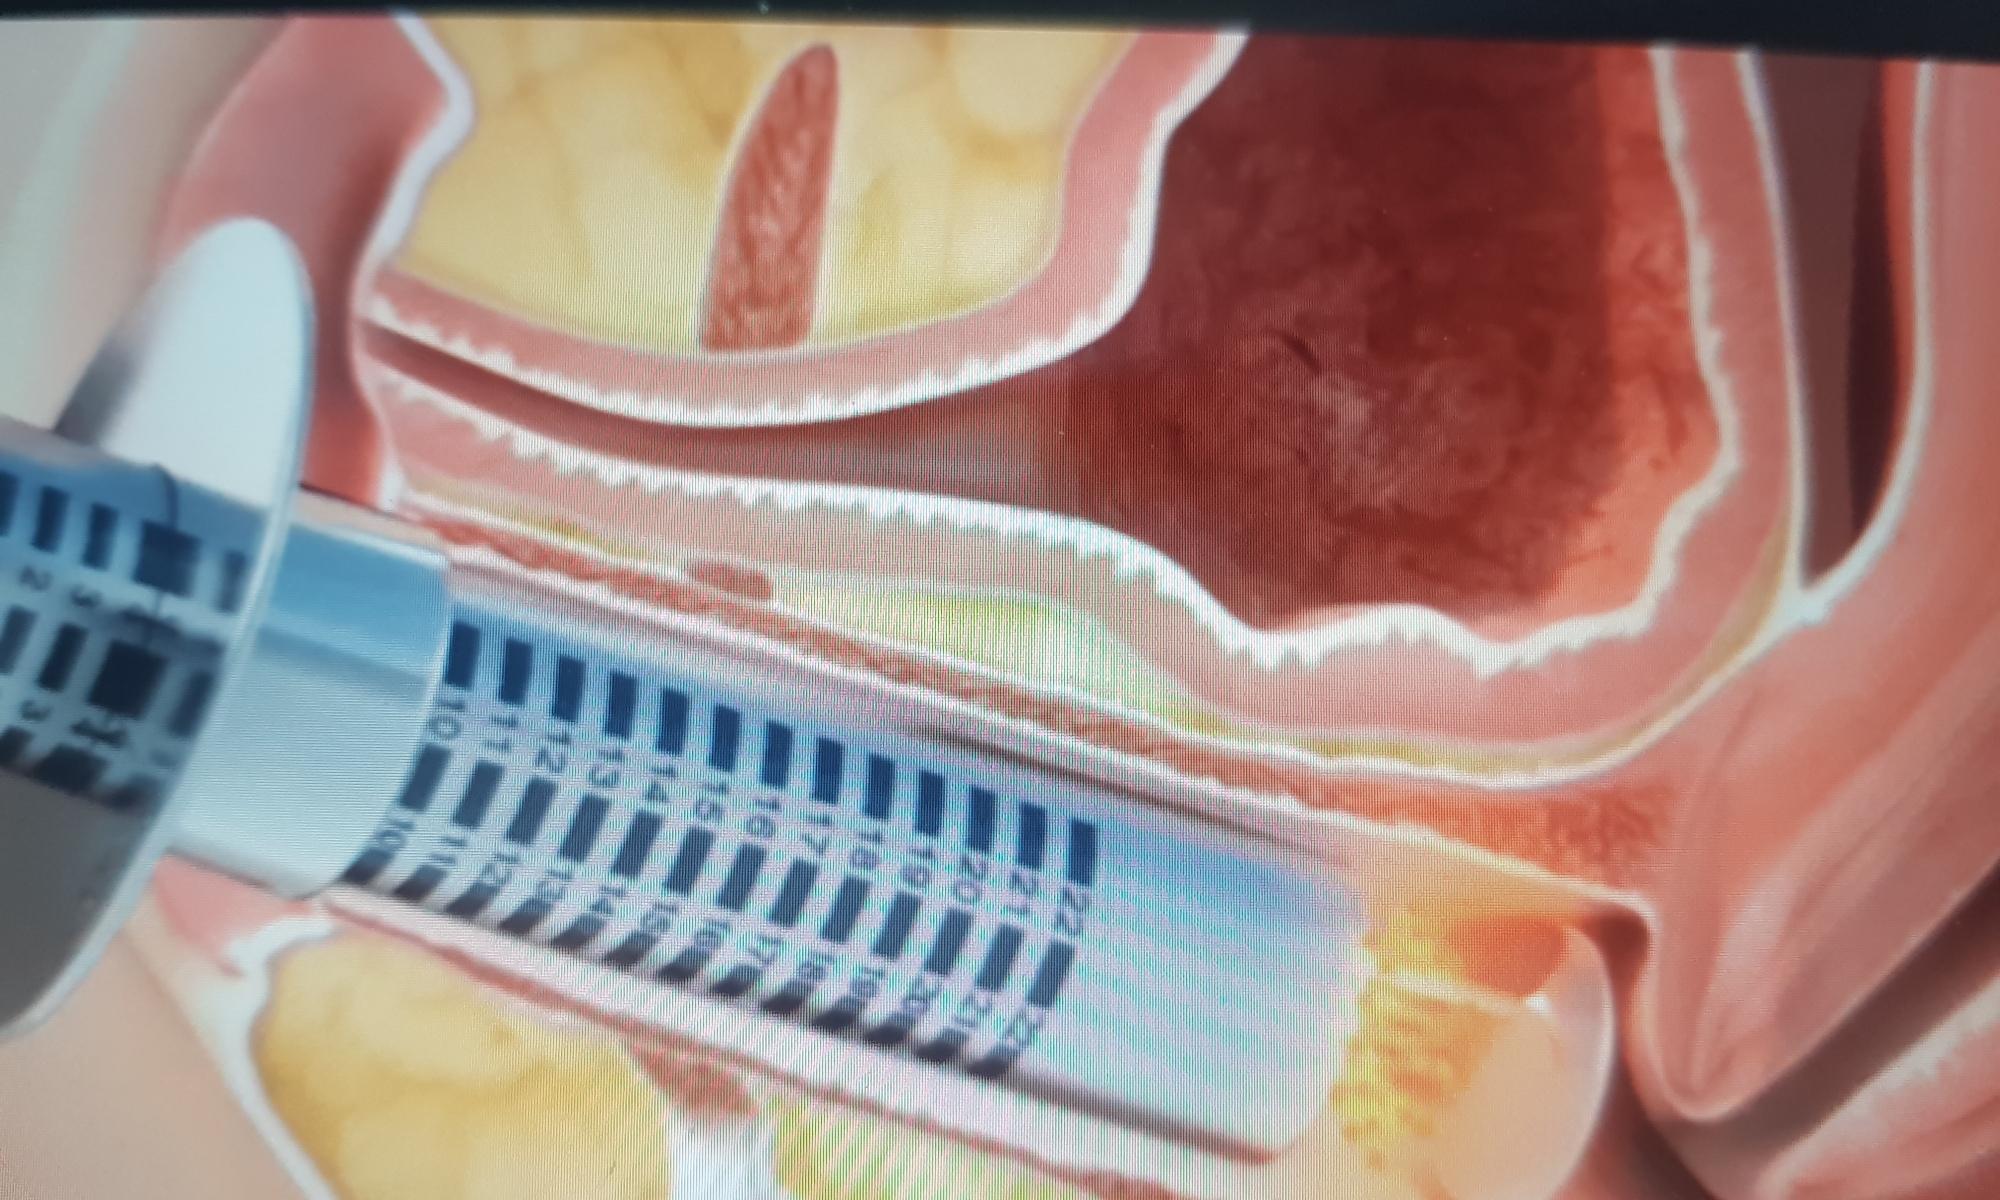 Lazerle Vajina Daraltma